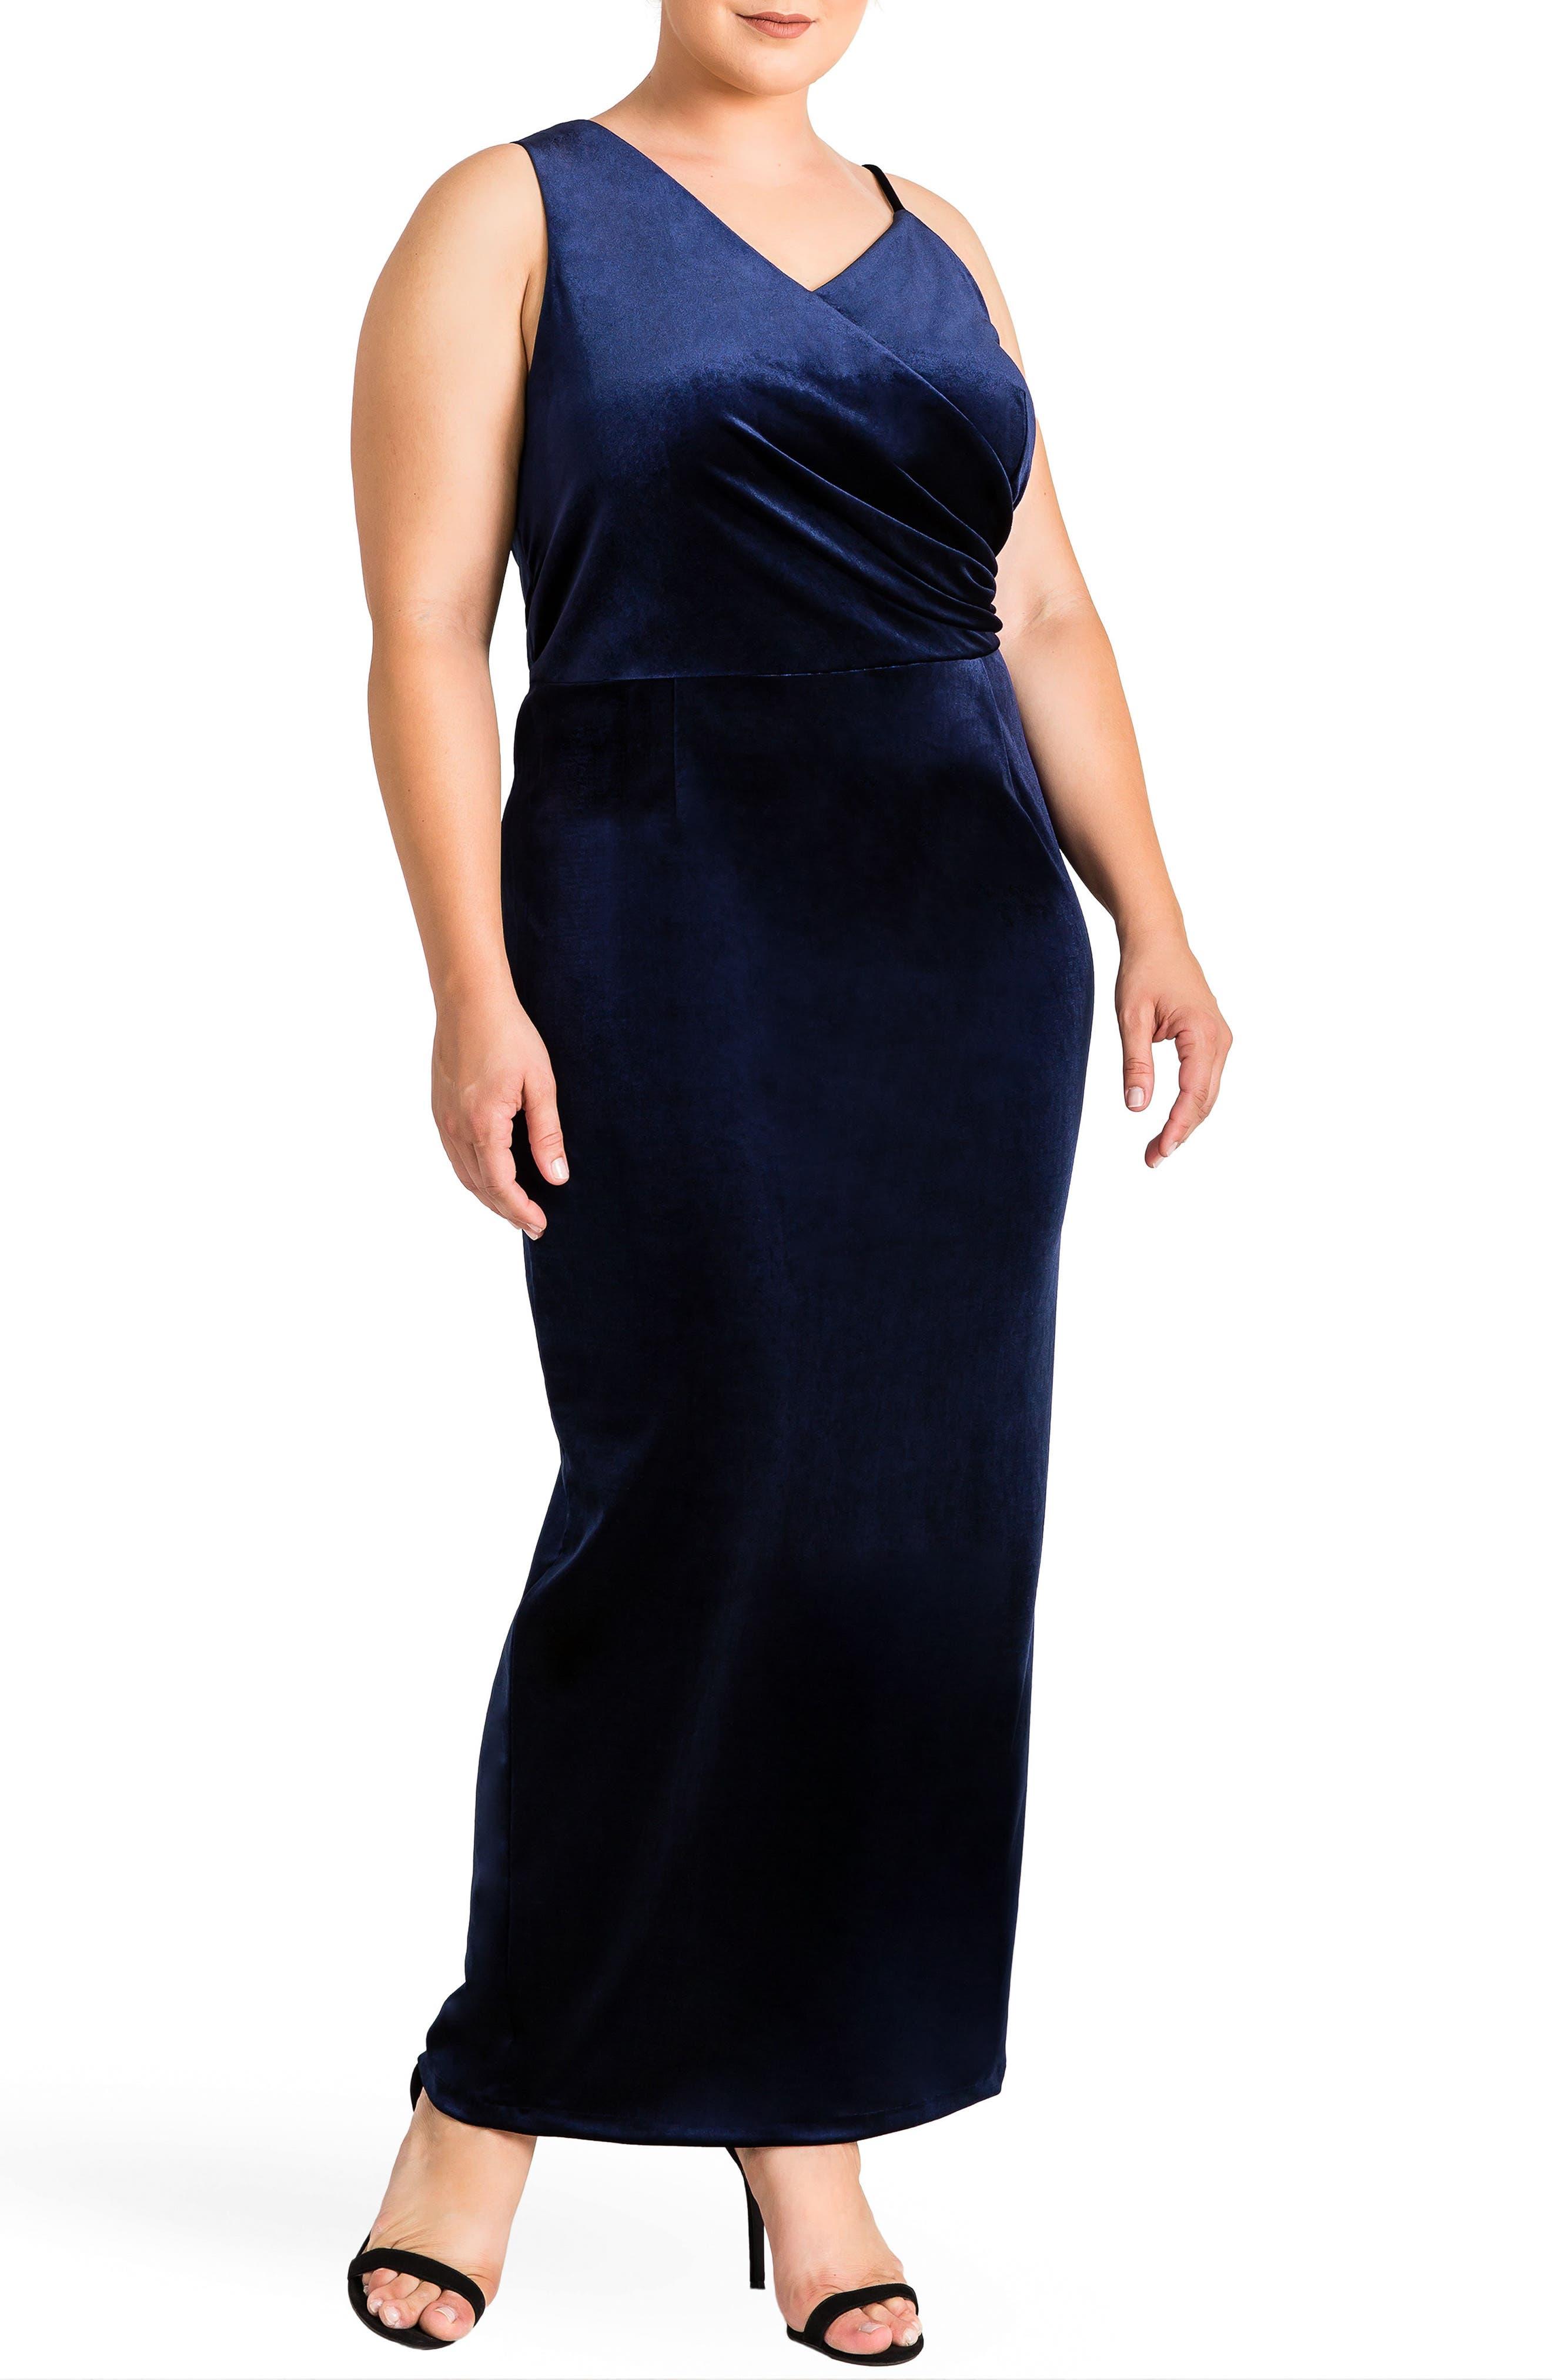 Regan Velvet Sheath Gown,                             Main thumbnail 1, color,                             410